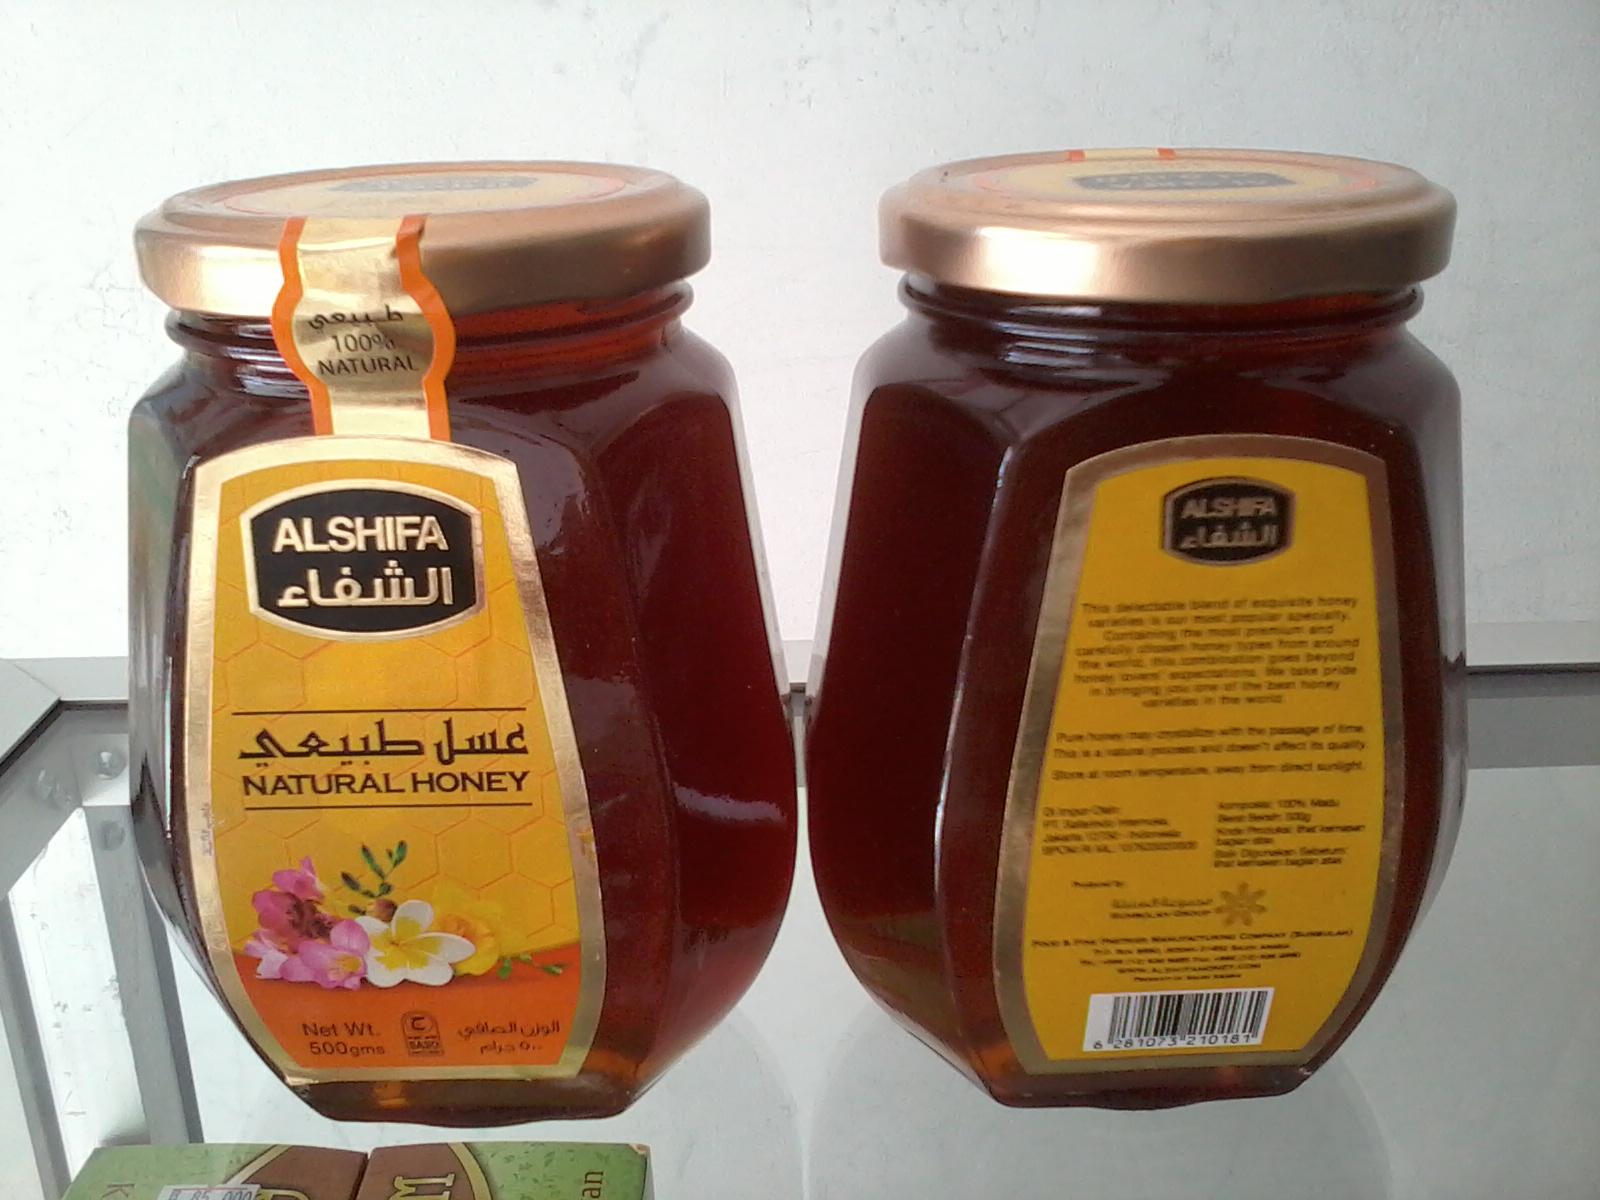 Madu Al Shifa Arab Natural Honey Original 250 Gram Daftar Alshifa Acacia 500gr Arobi 125 Source Jual